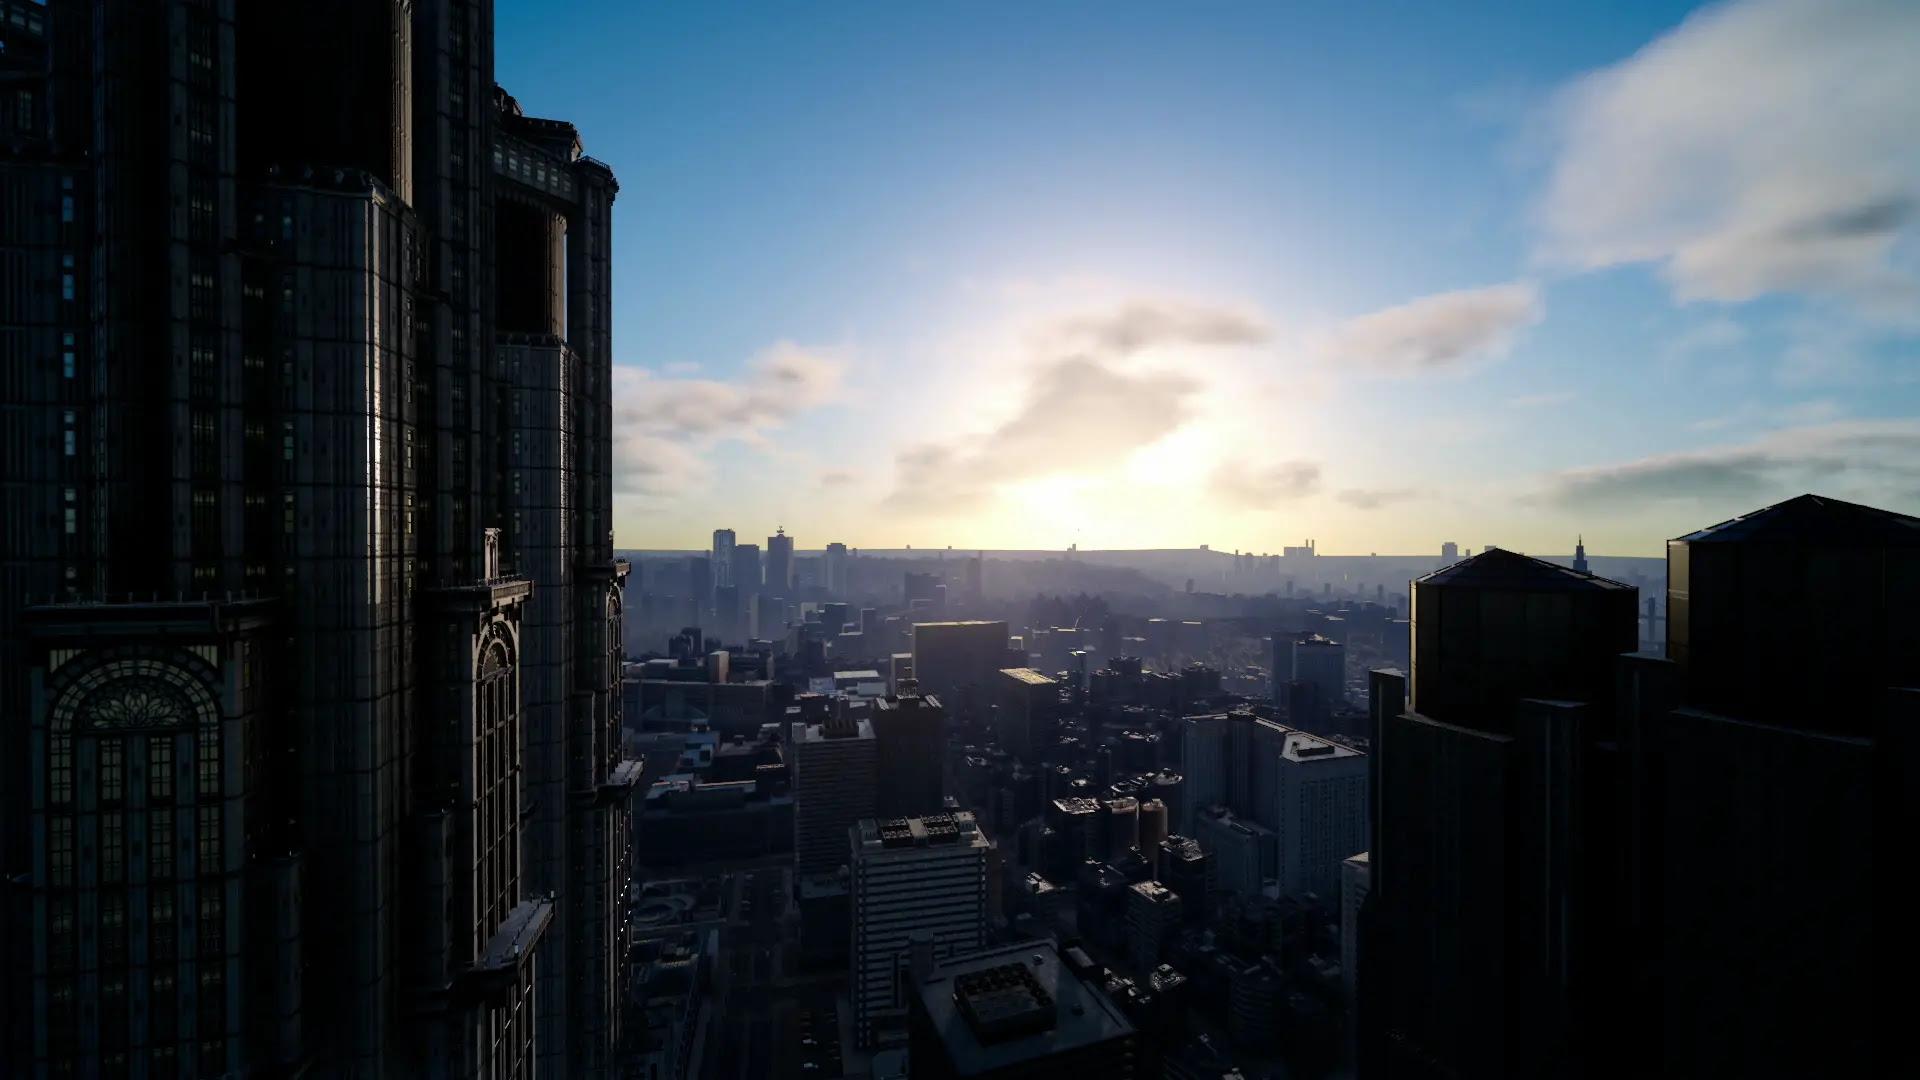 Final Fantasy Xv Director Chats Ongoing Development Dlc Plans Pc